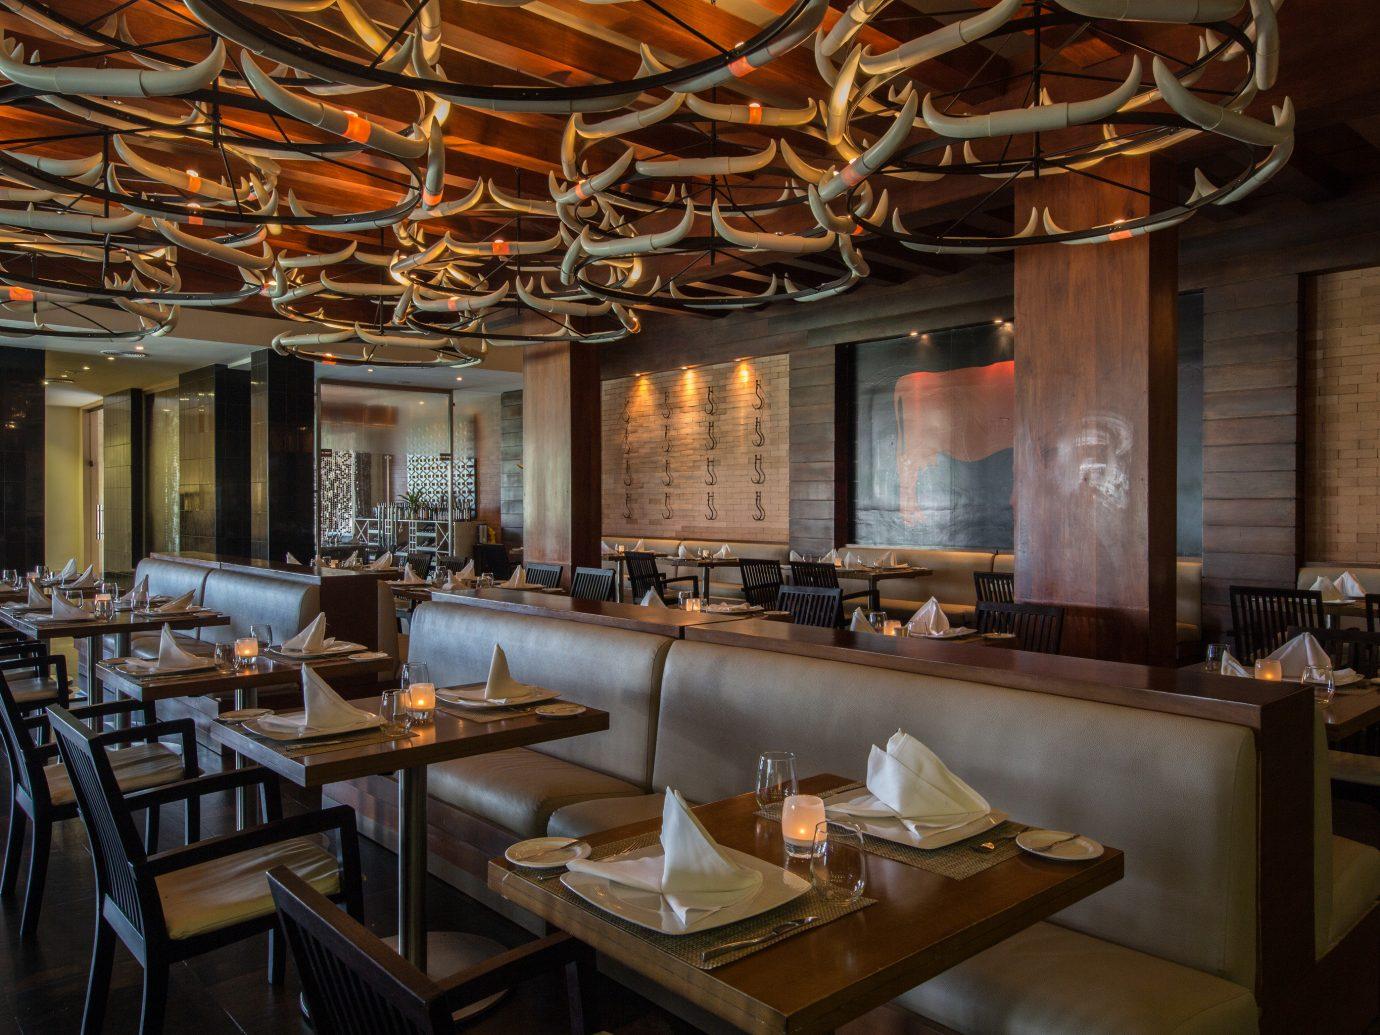 Hotels indoor table floor ceiling property room restaurant estate interior design Bar